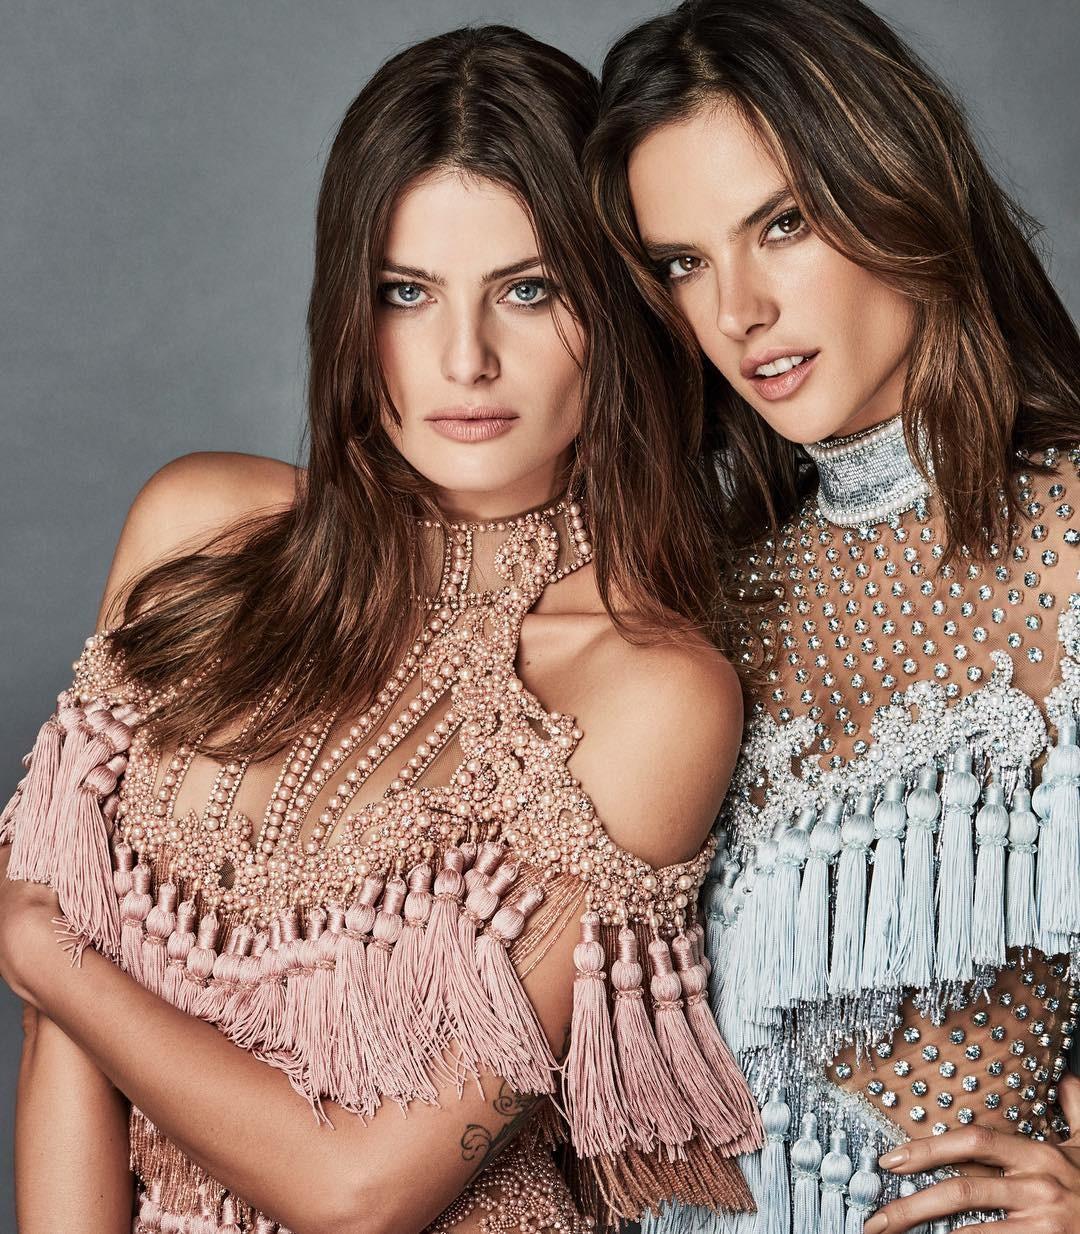 Alessandra Ambrosio e Isabeli Fontana (Foto: Vogue Brasil)